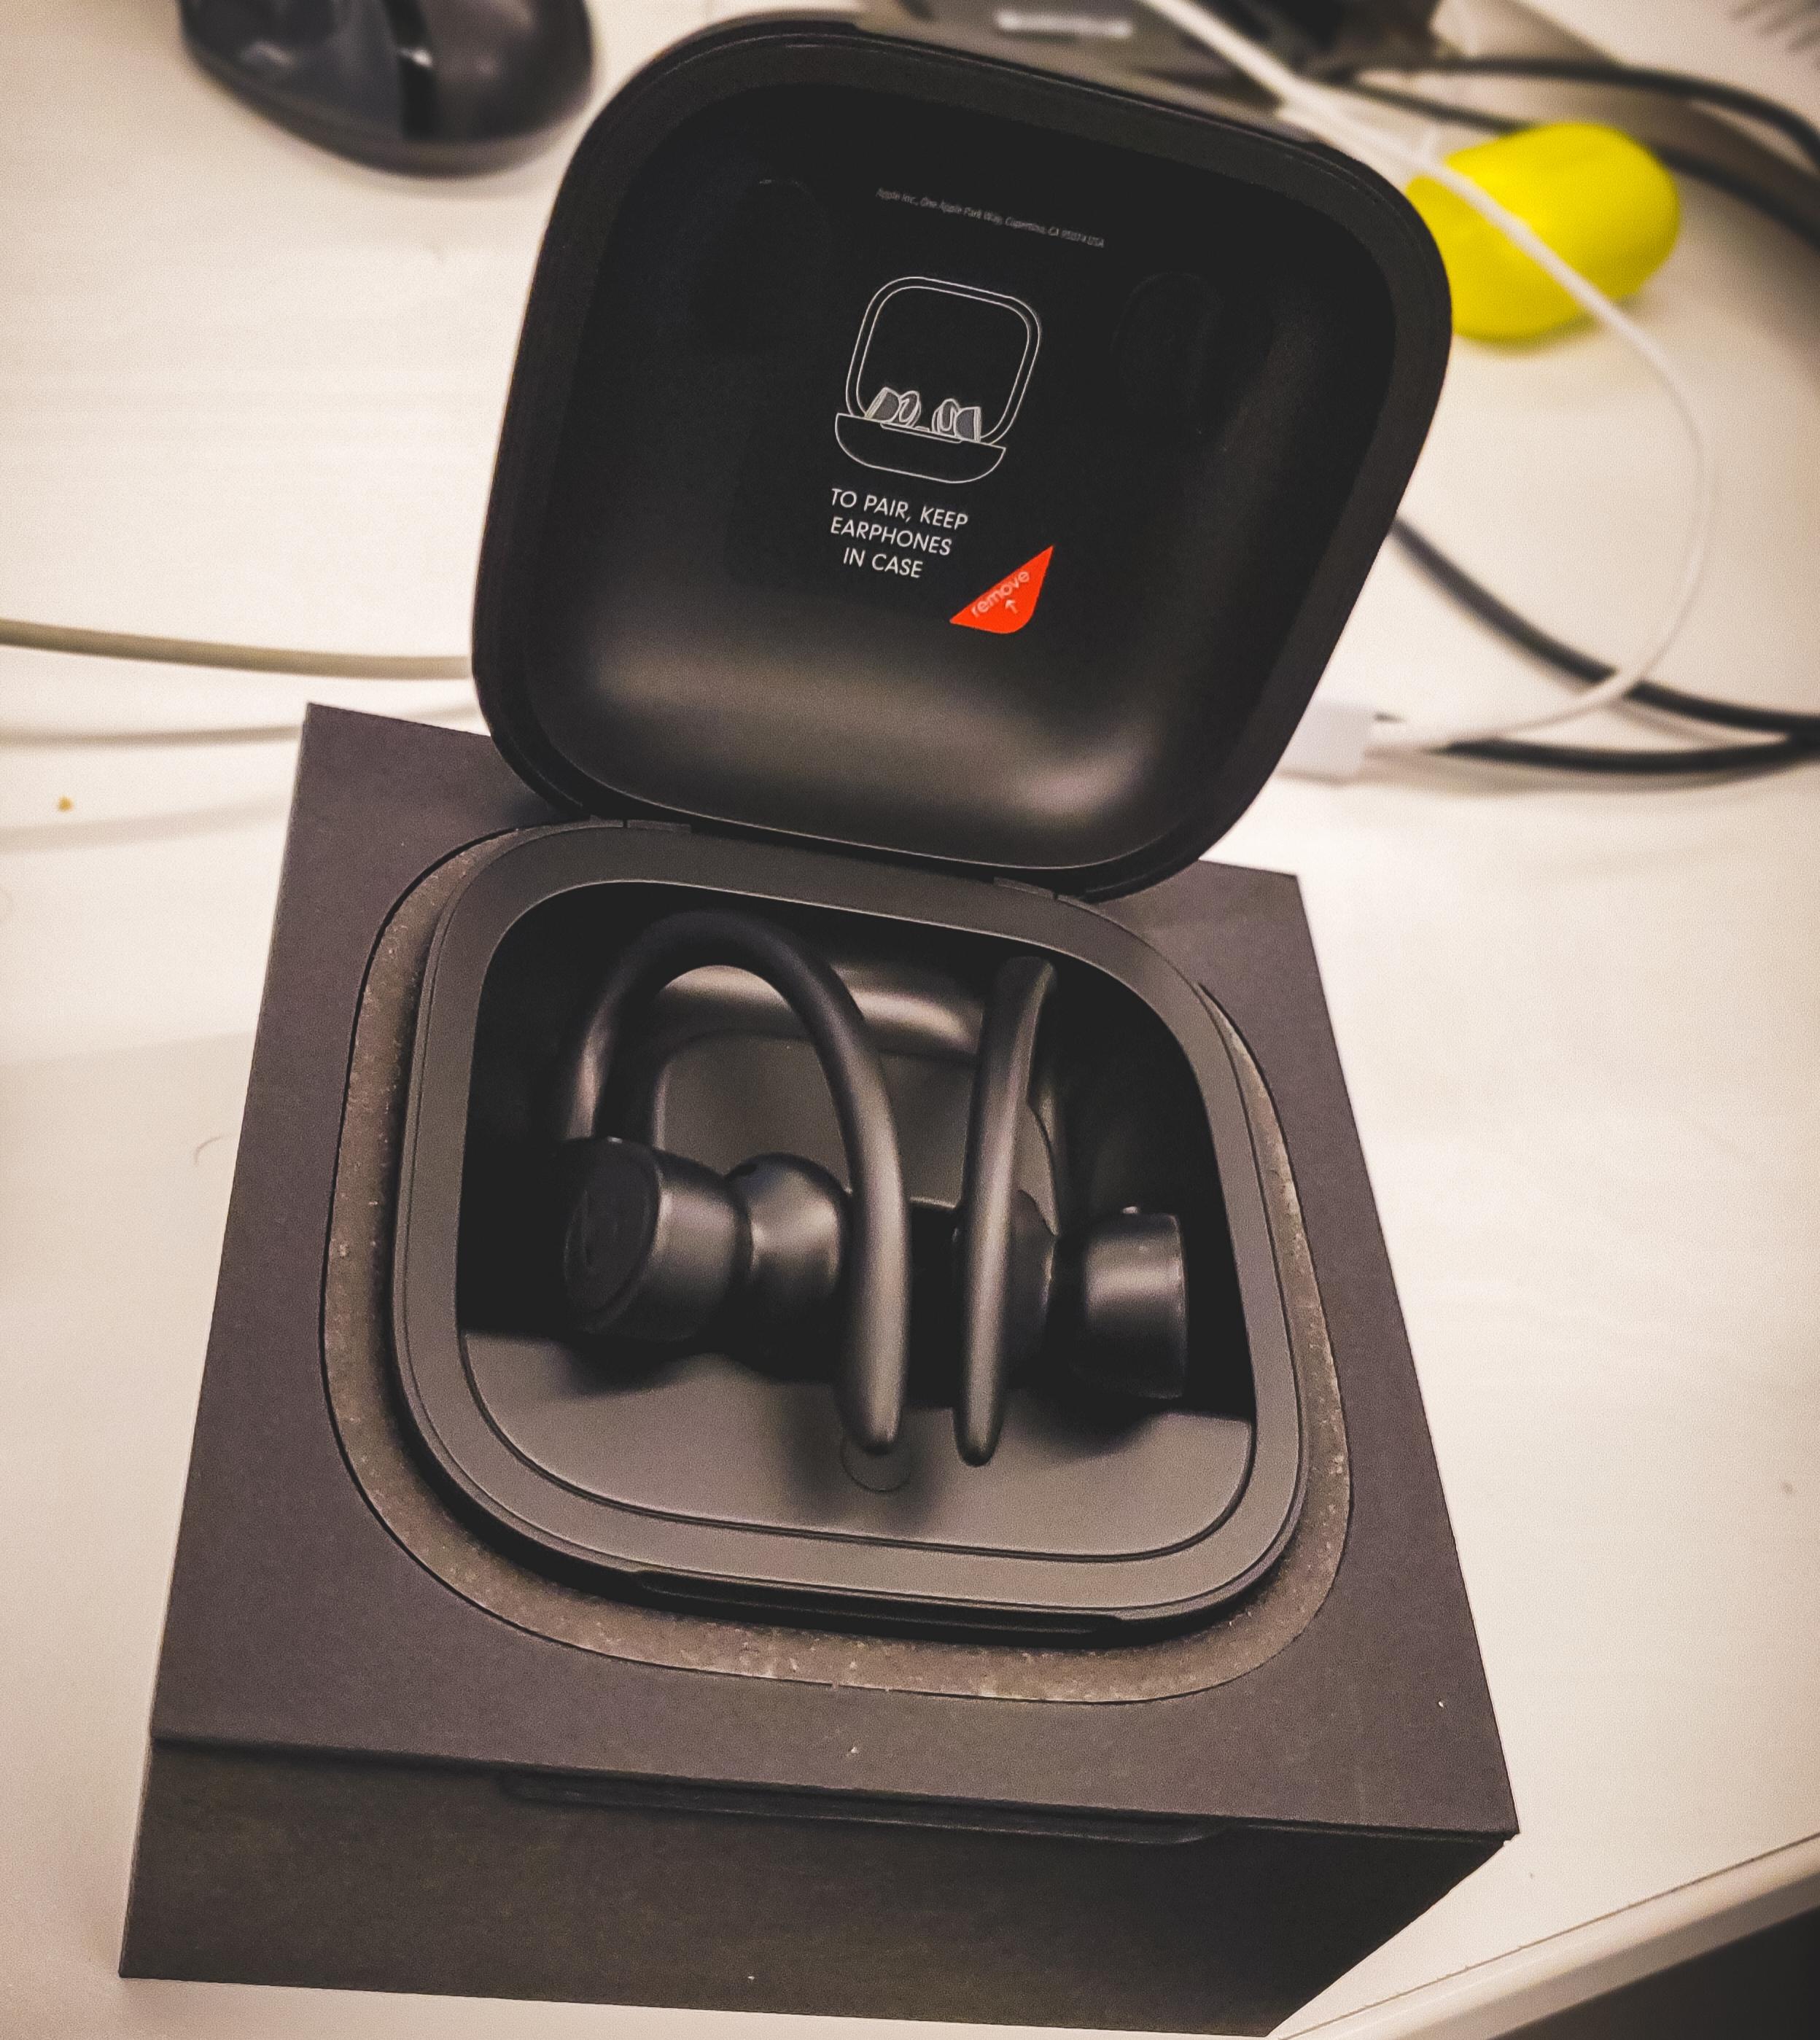 Beats By Dre PowerBeats Pro and Samsung Galaxy Buds